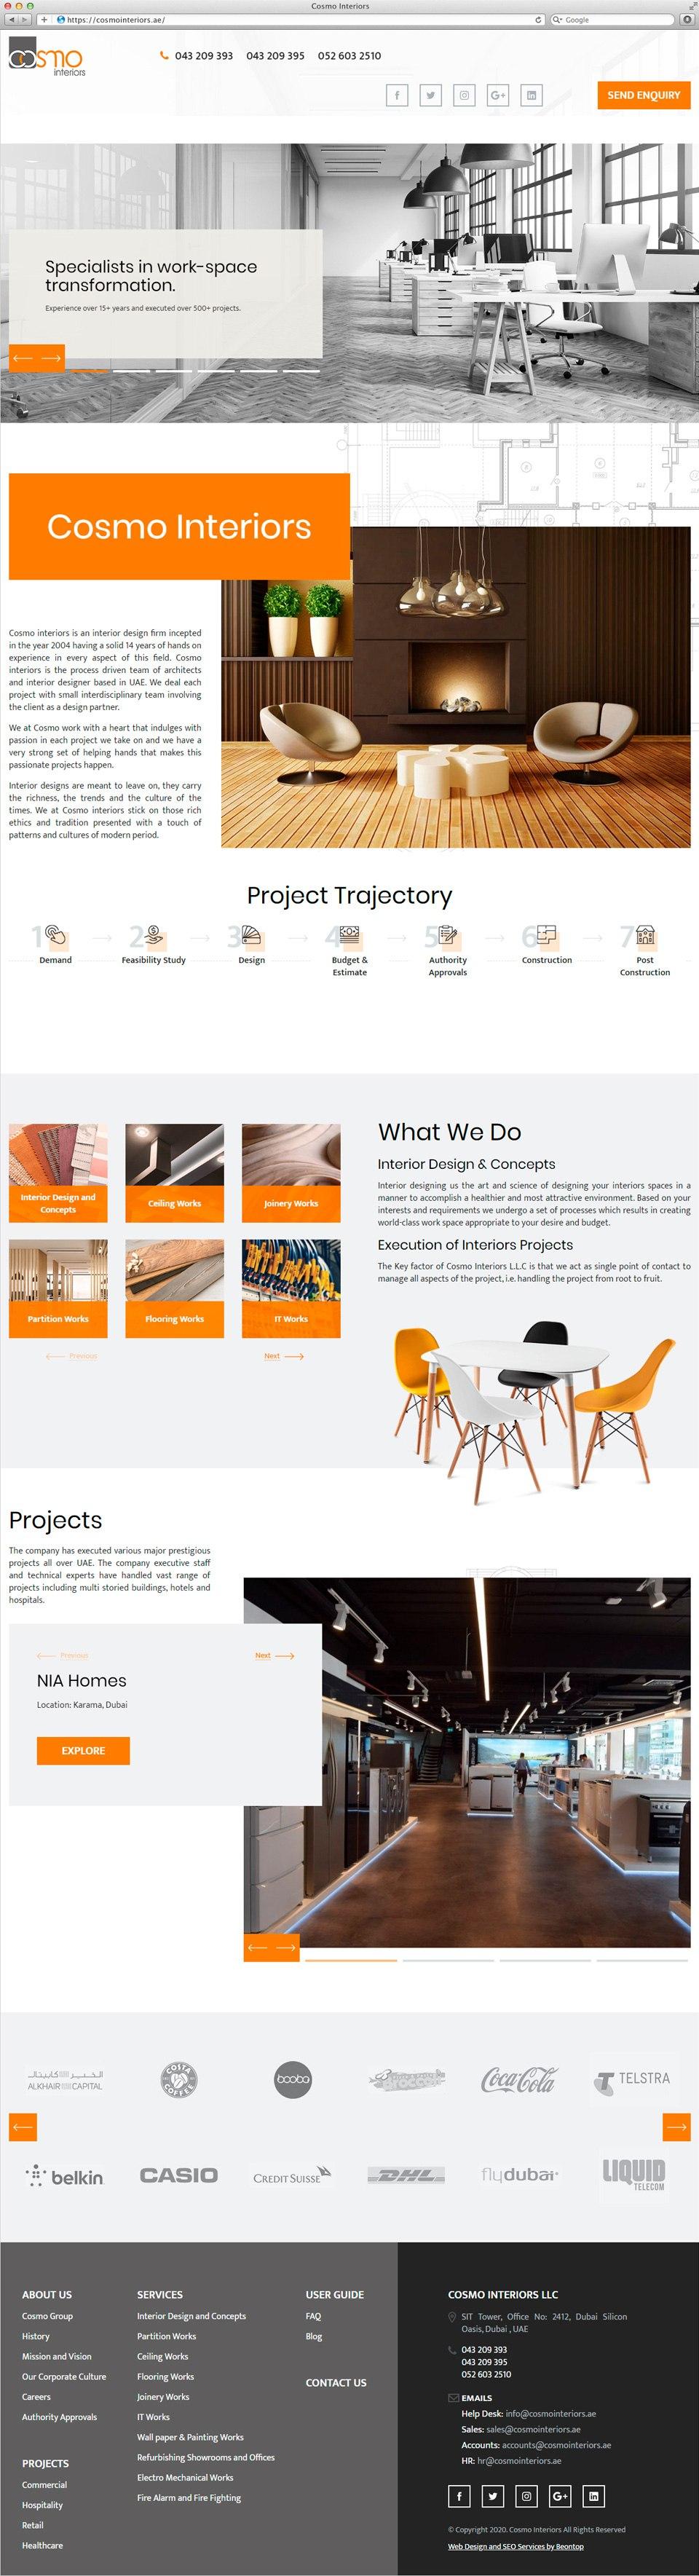 Cosmo Interiors | Beontop Portfolio Homepage